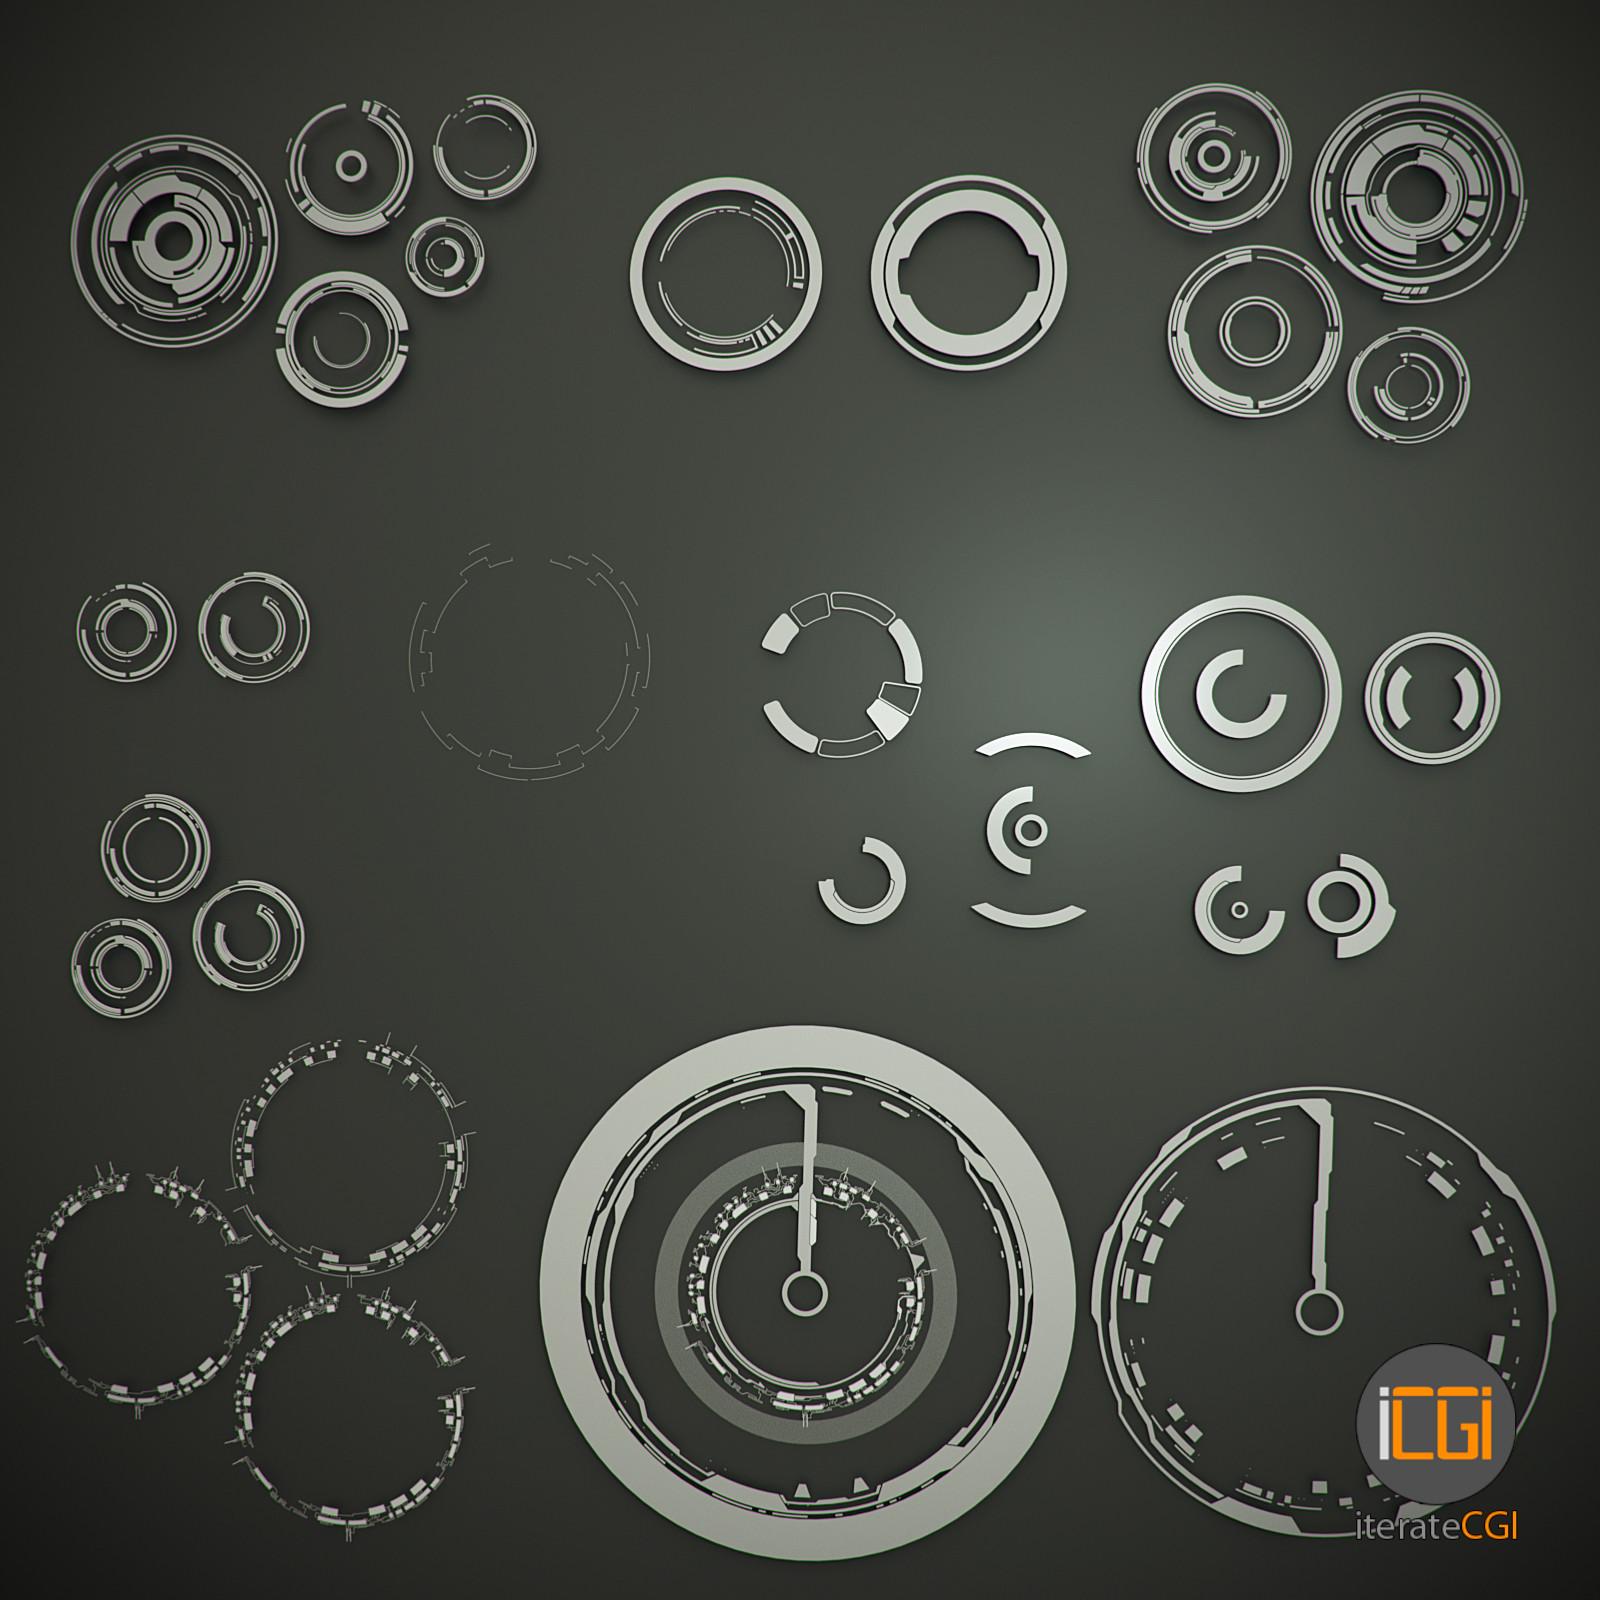 Johan de leenheer tech circles 1 67